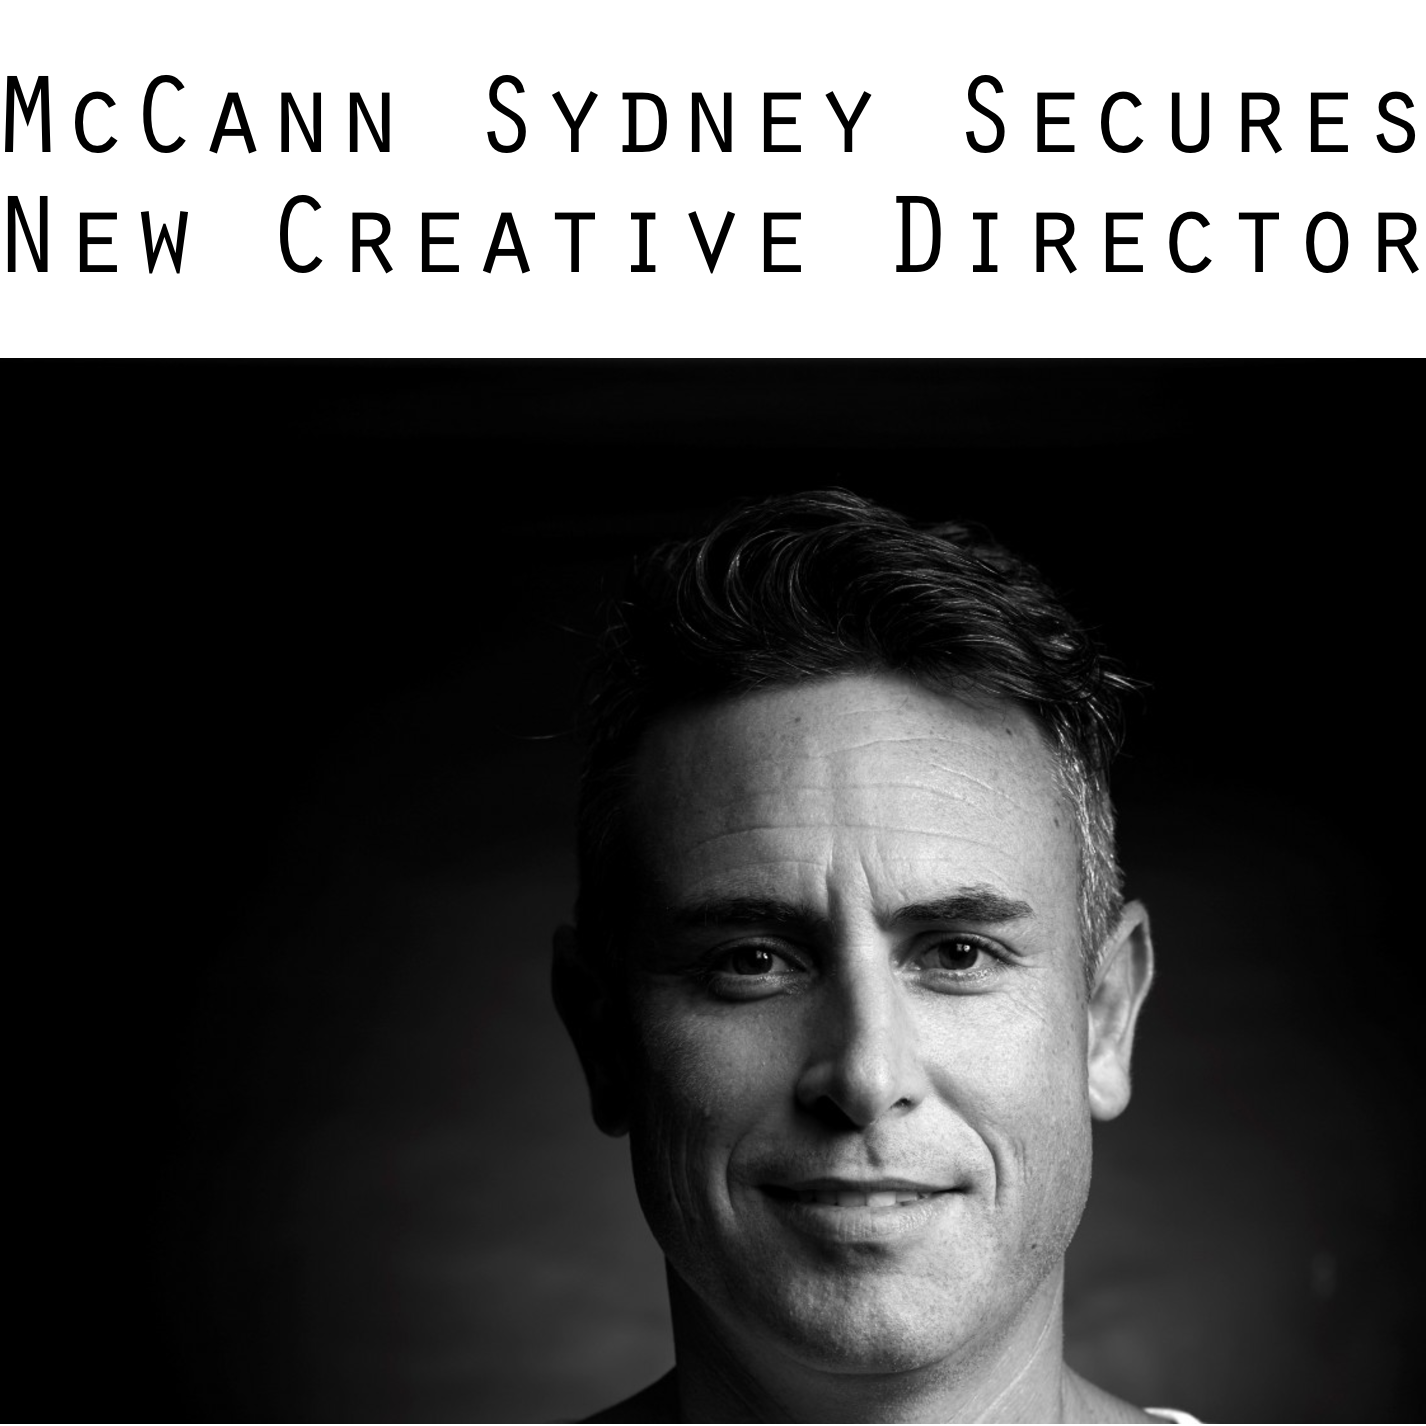 B&T   McCann Sydney Secures New Creative Director